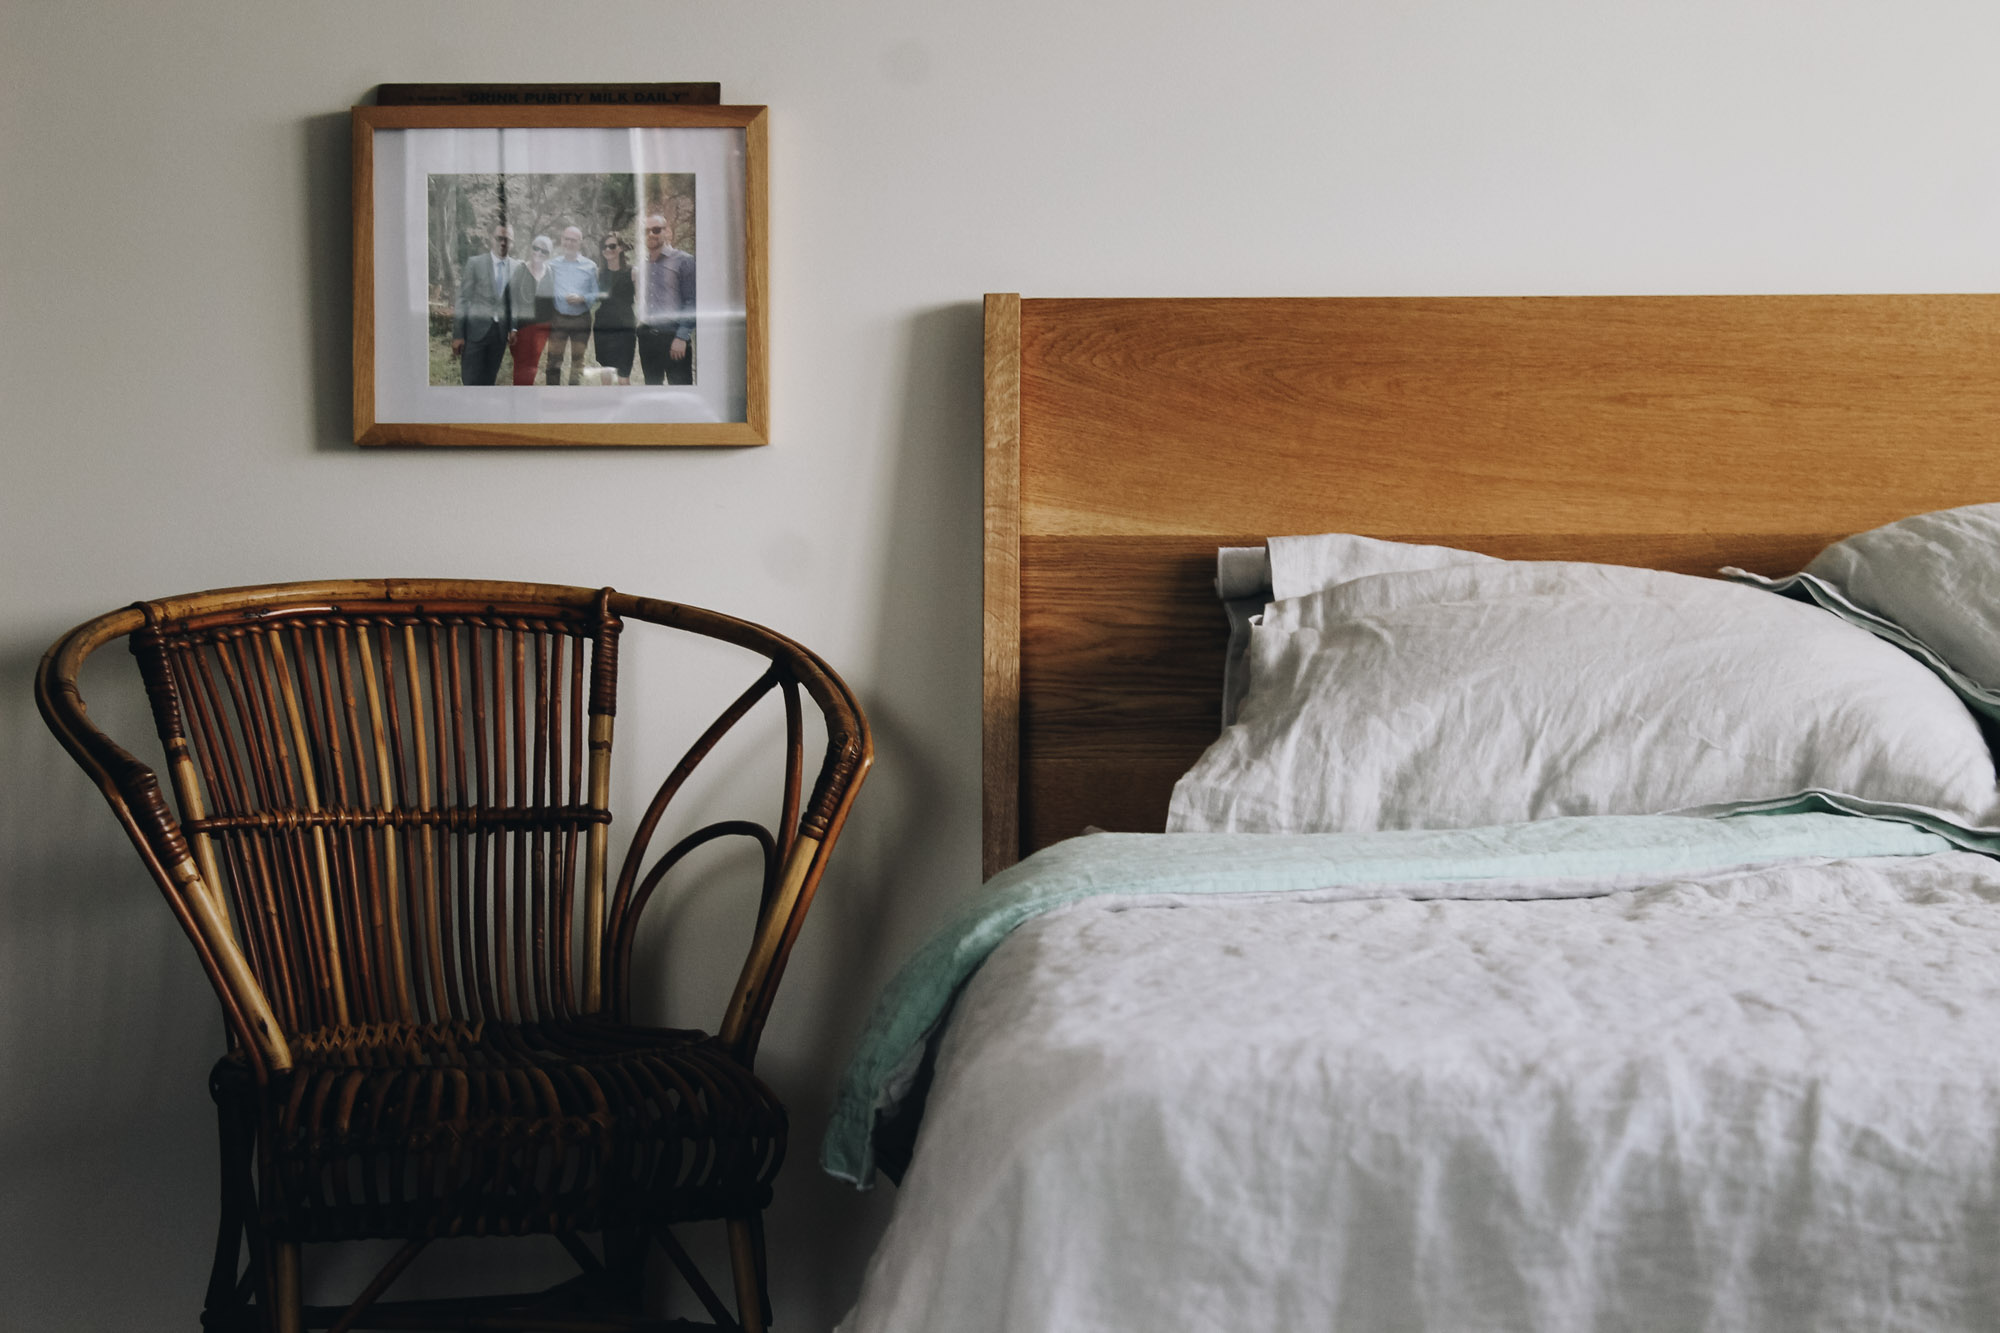 Al+and+Imo+Handmade-mod-bed-custom-american-oak-bed-frame-mid-century-inspired-surf-coast-melbourne-australia-8.jpg